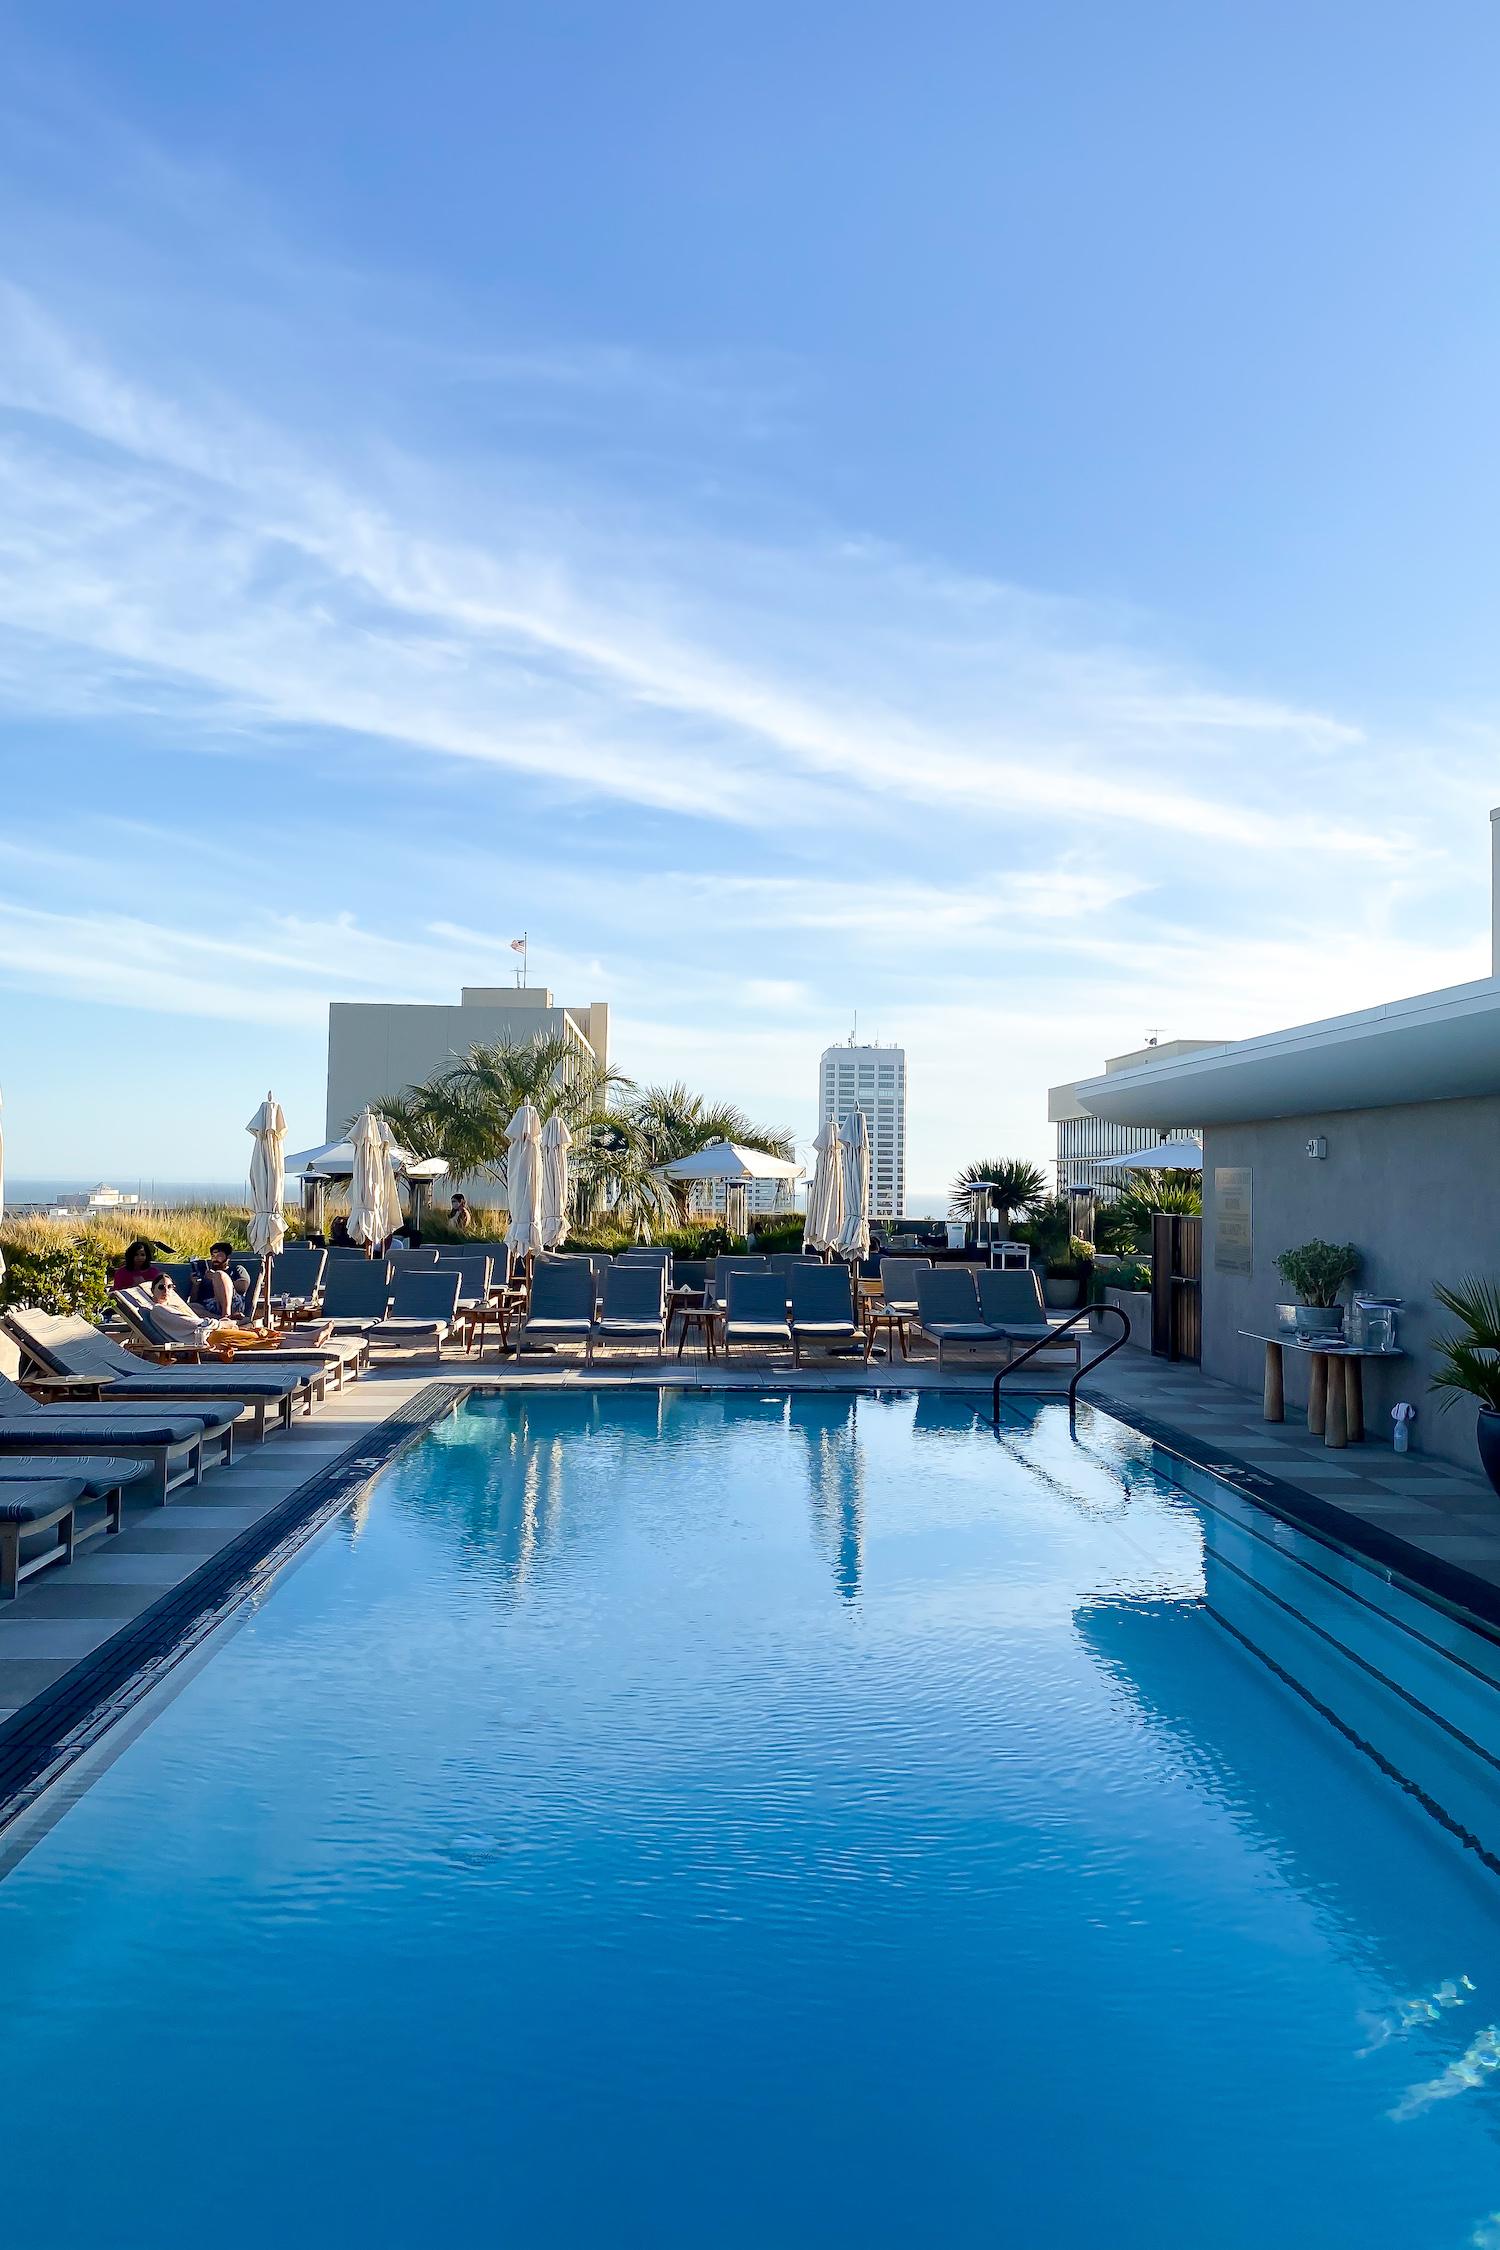 The Proper Hotel pool